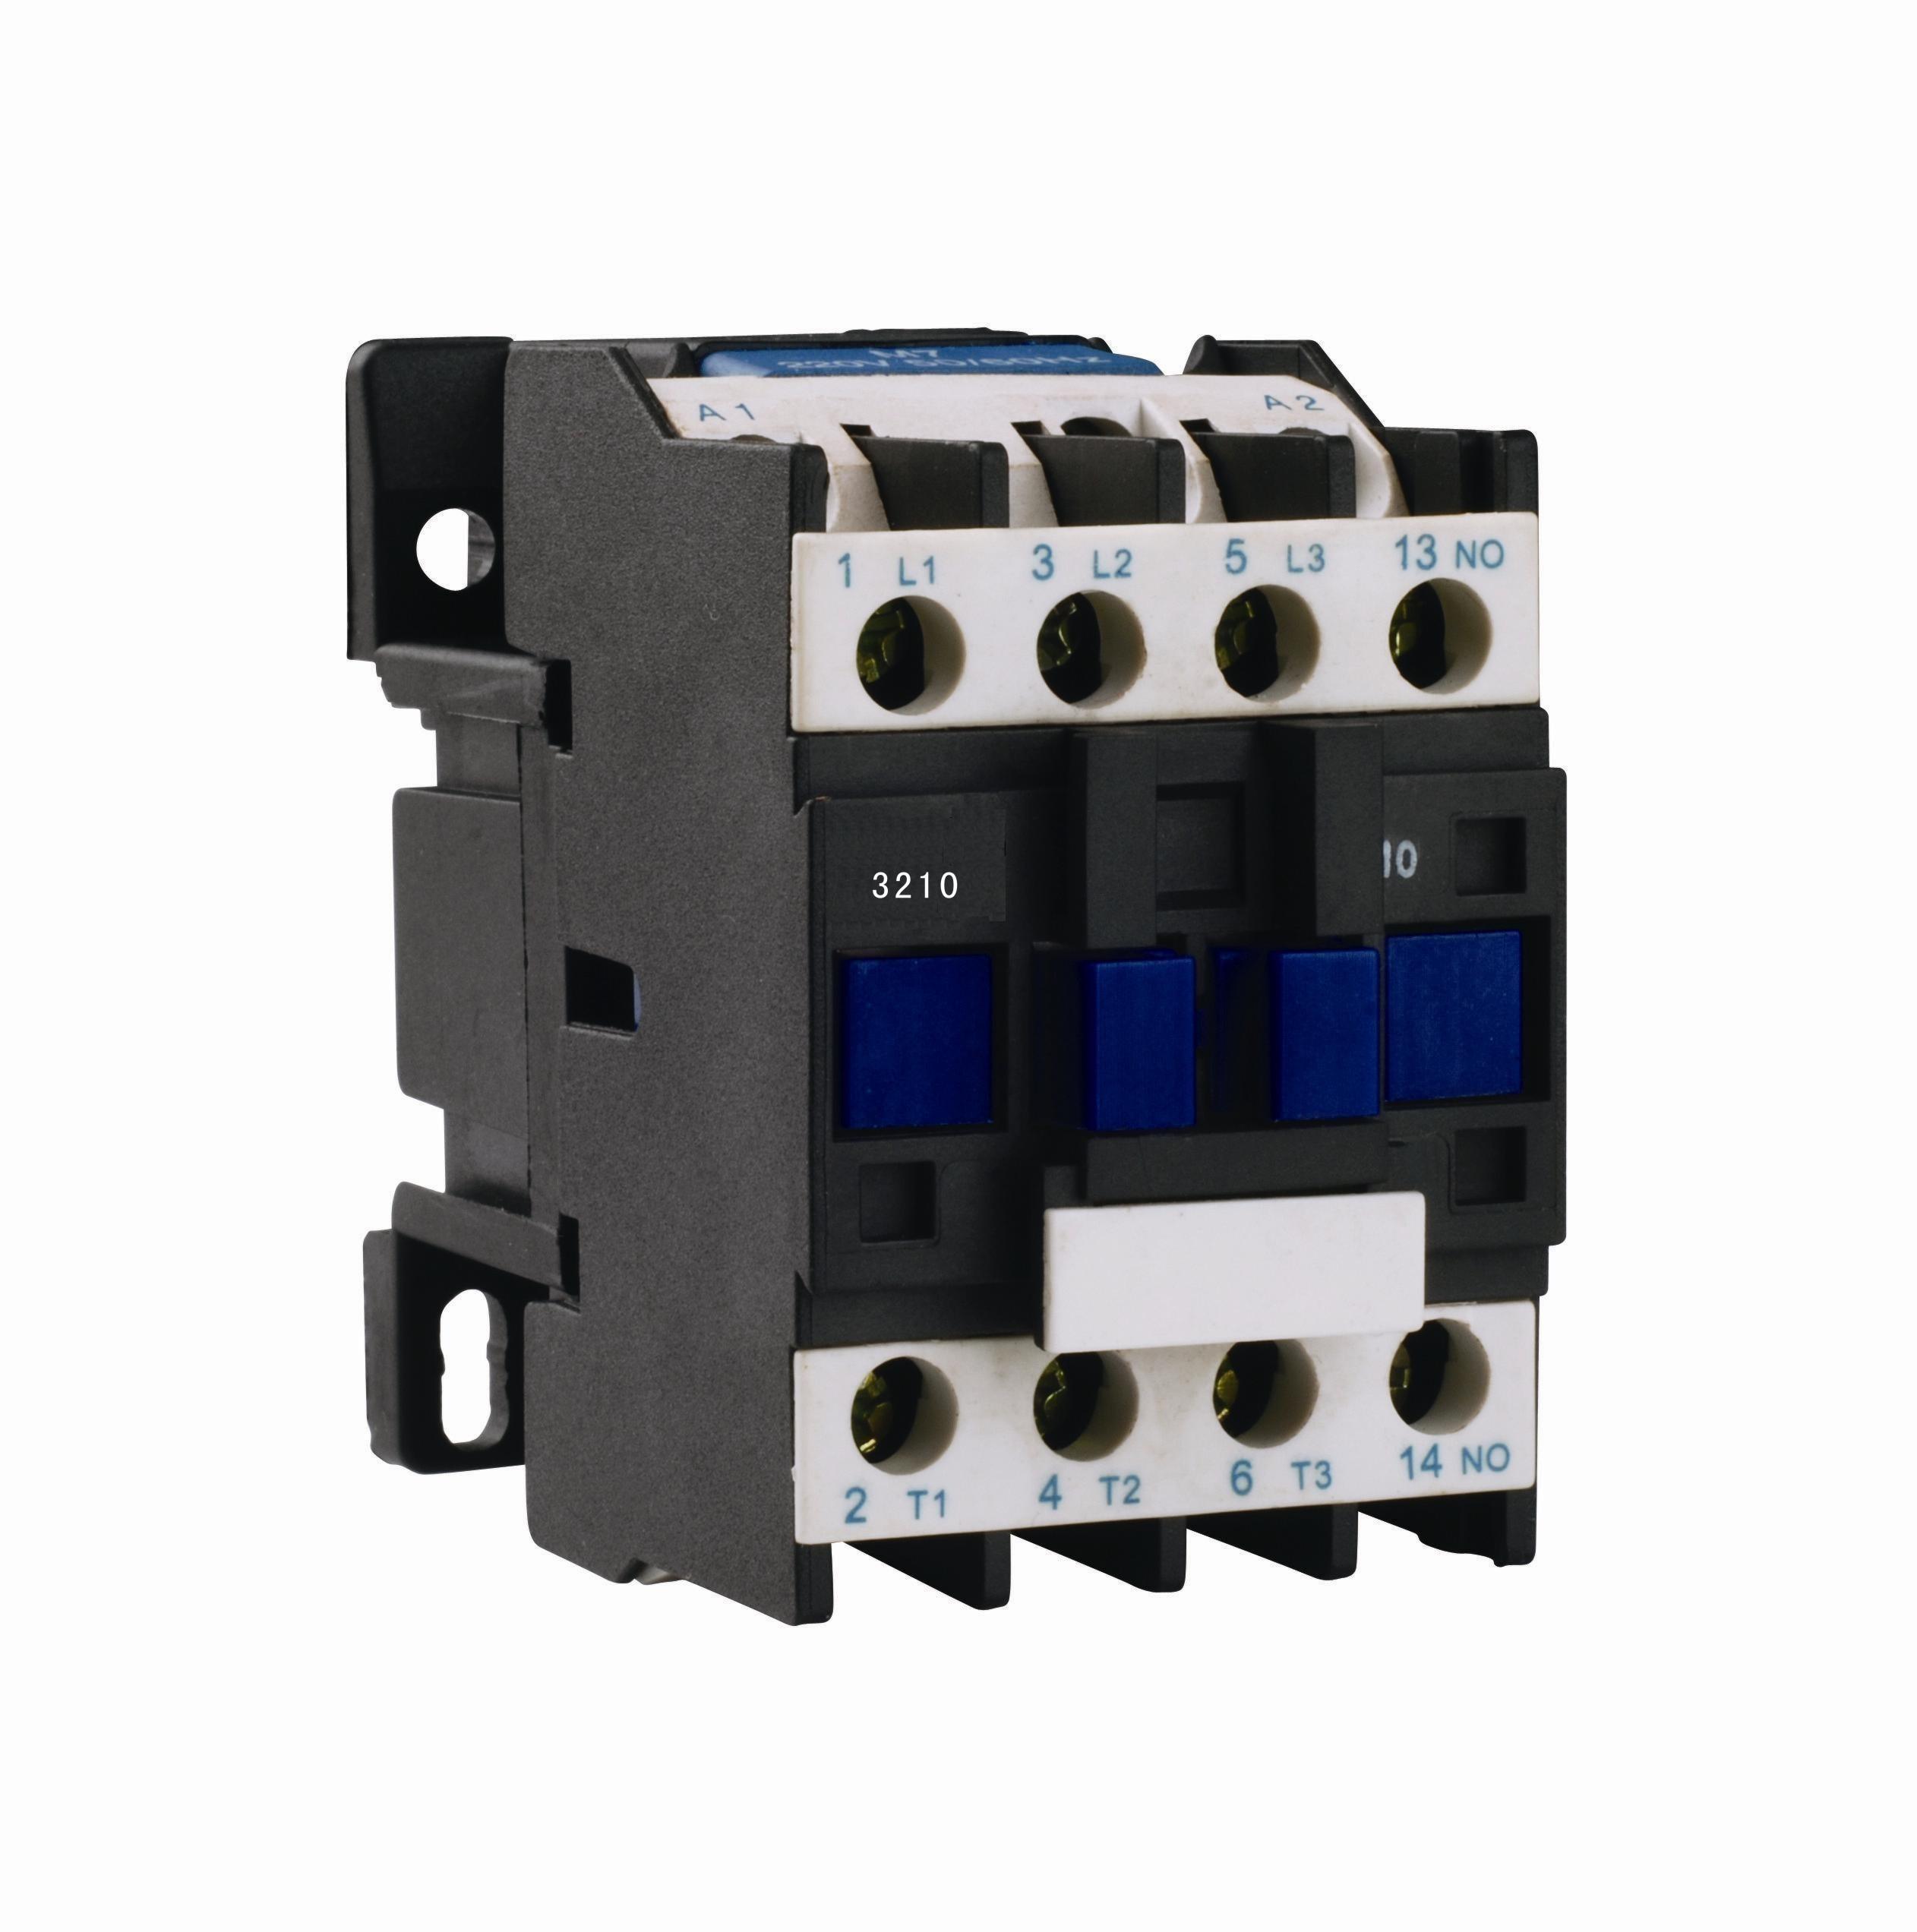 Розетка Runjie CJX2-3210 220V 380V LC1-D3210 ac contactor lc1f115 lc1 f115 lc1f115q7 380v lc1f115r7 440v lc1f115u7 240v lc1f115v7 400v